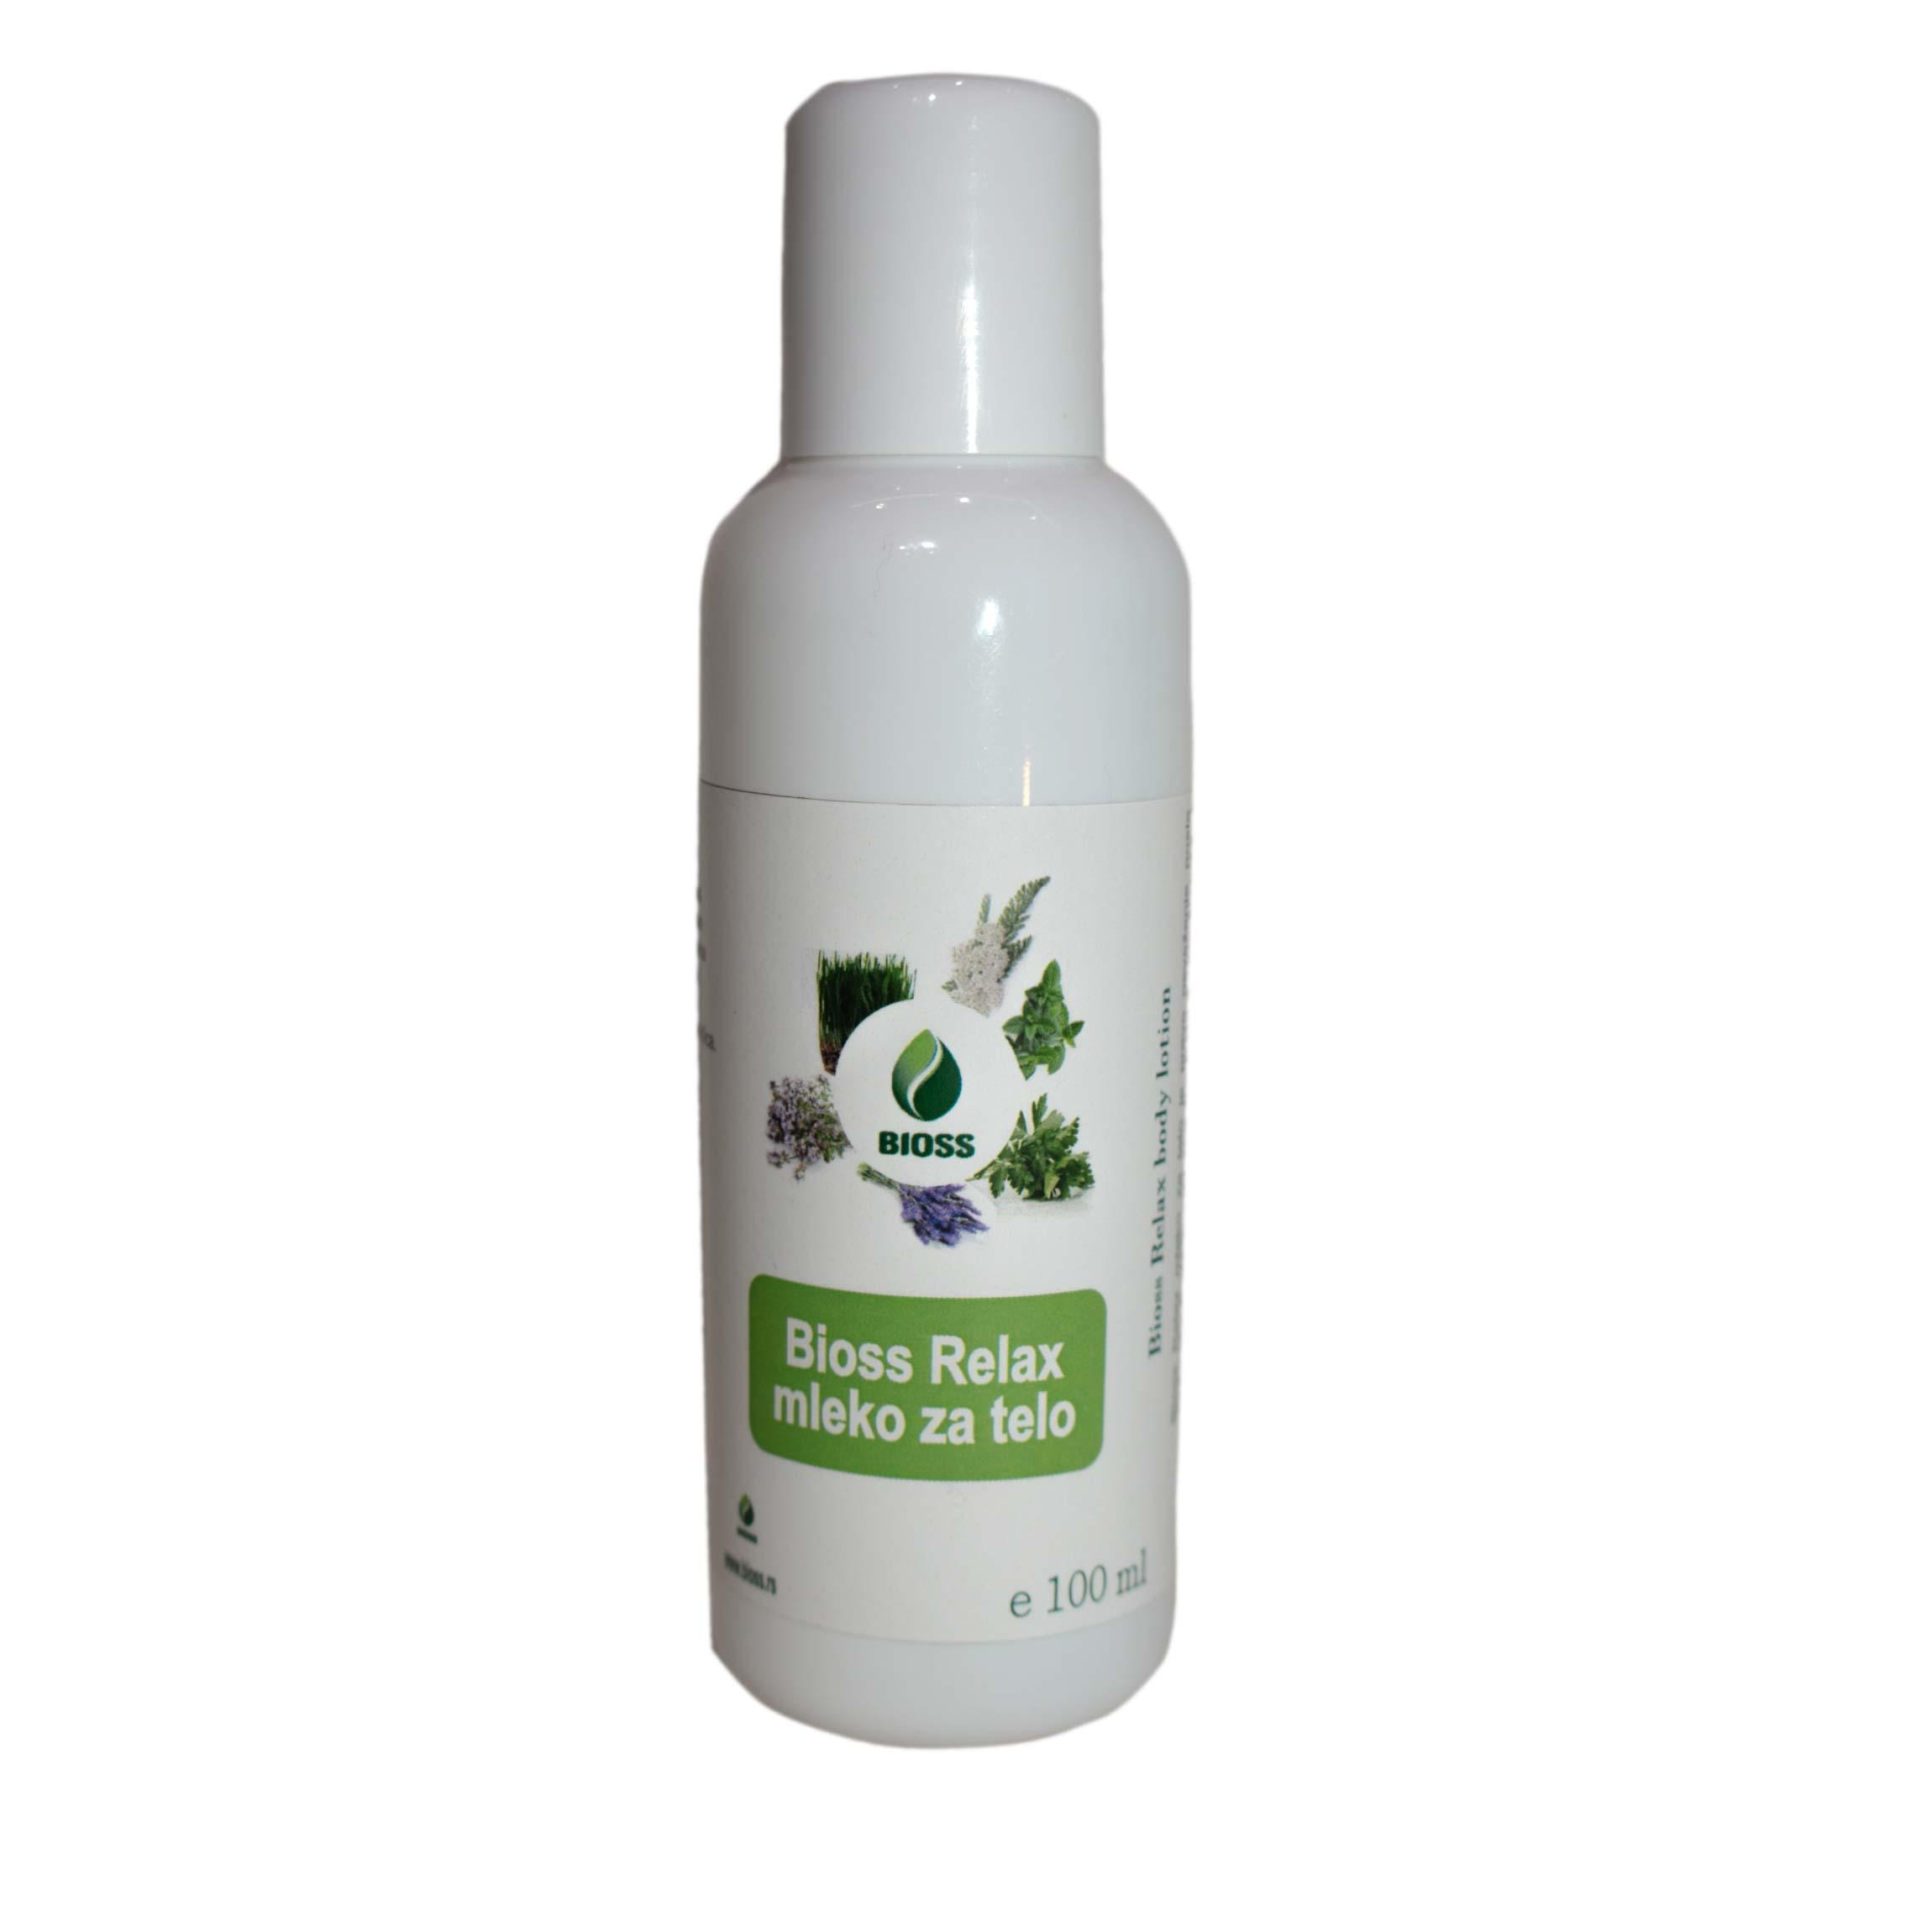 prirodna mleka za telo prirodni losioni za telo prirodna kozmetika